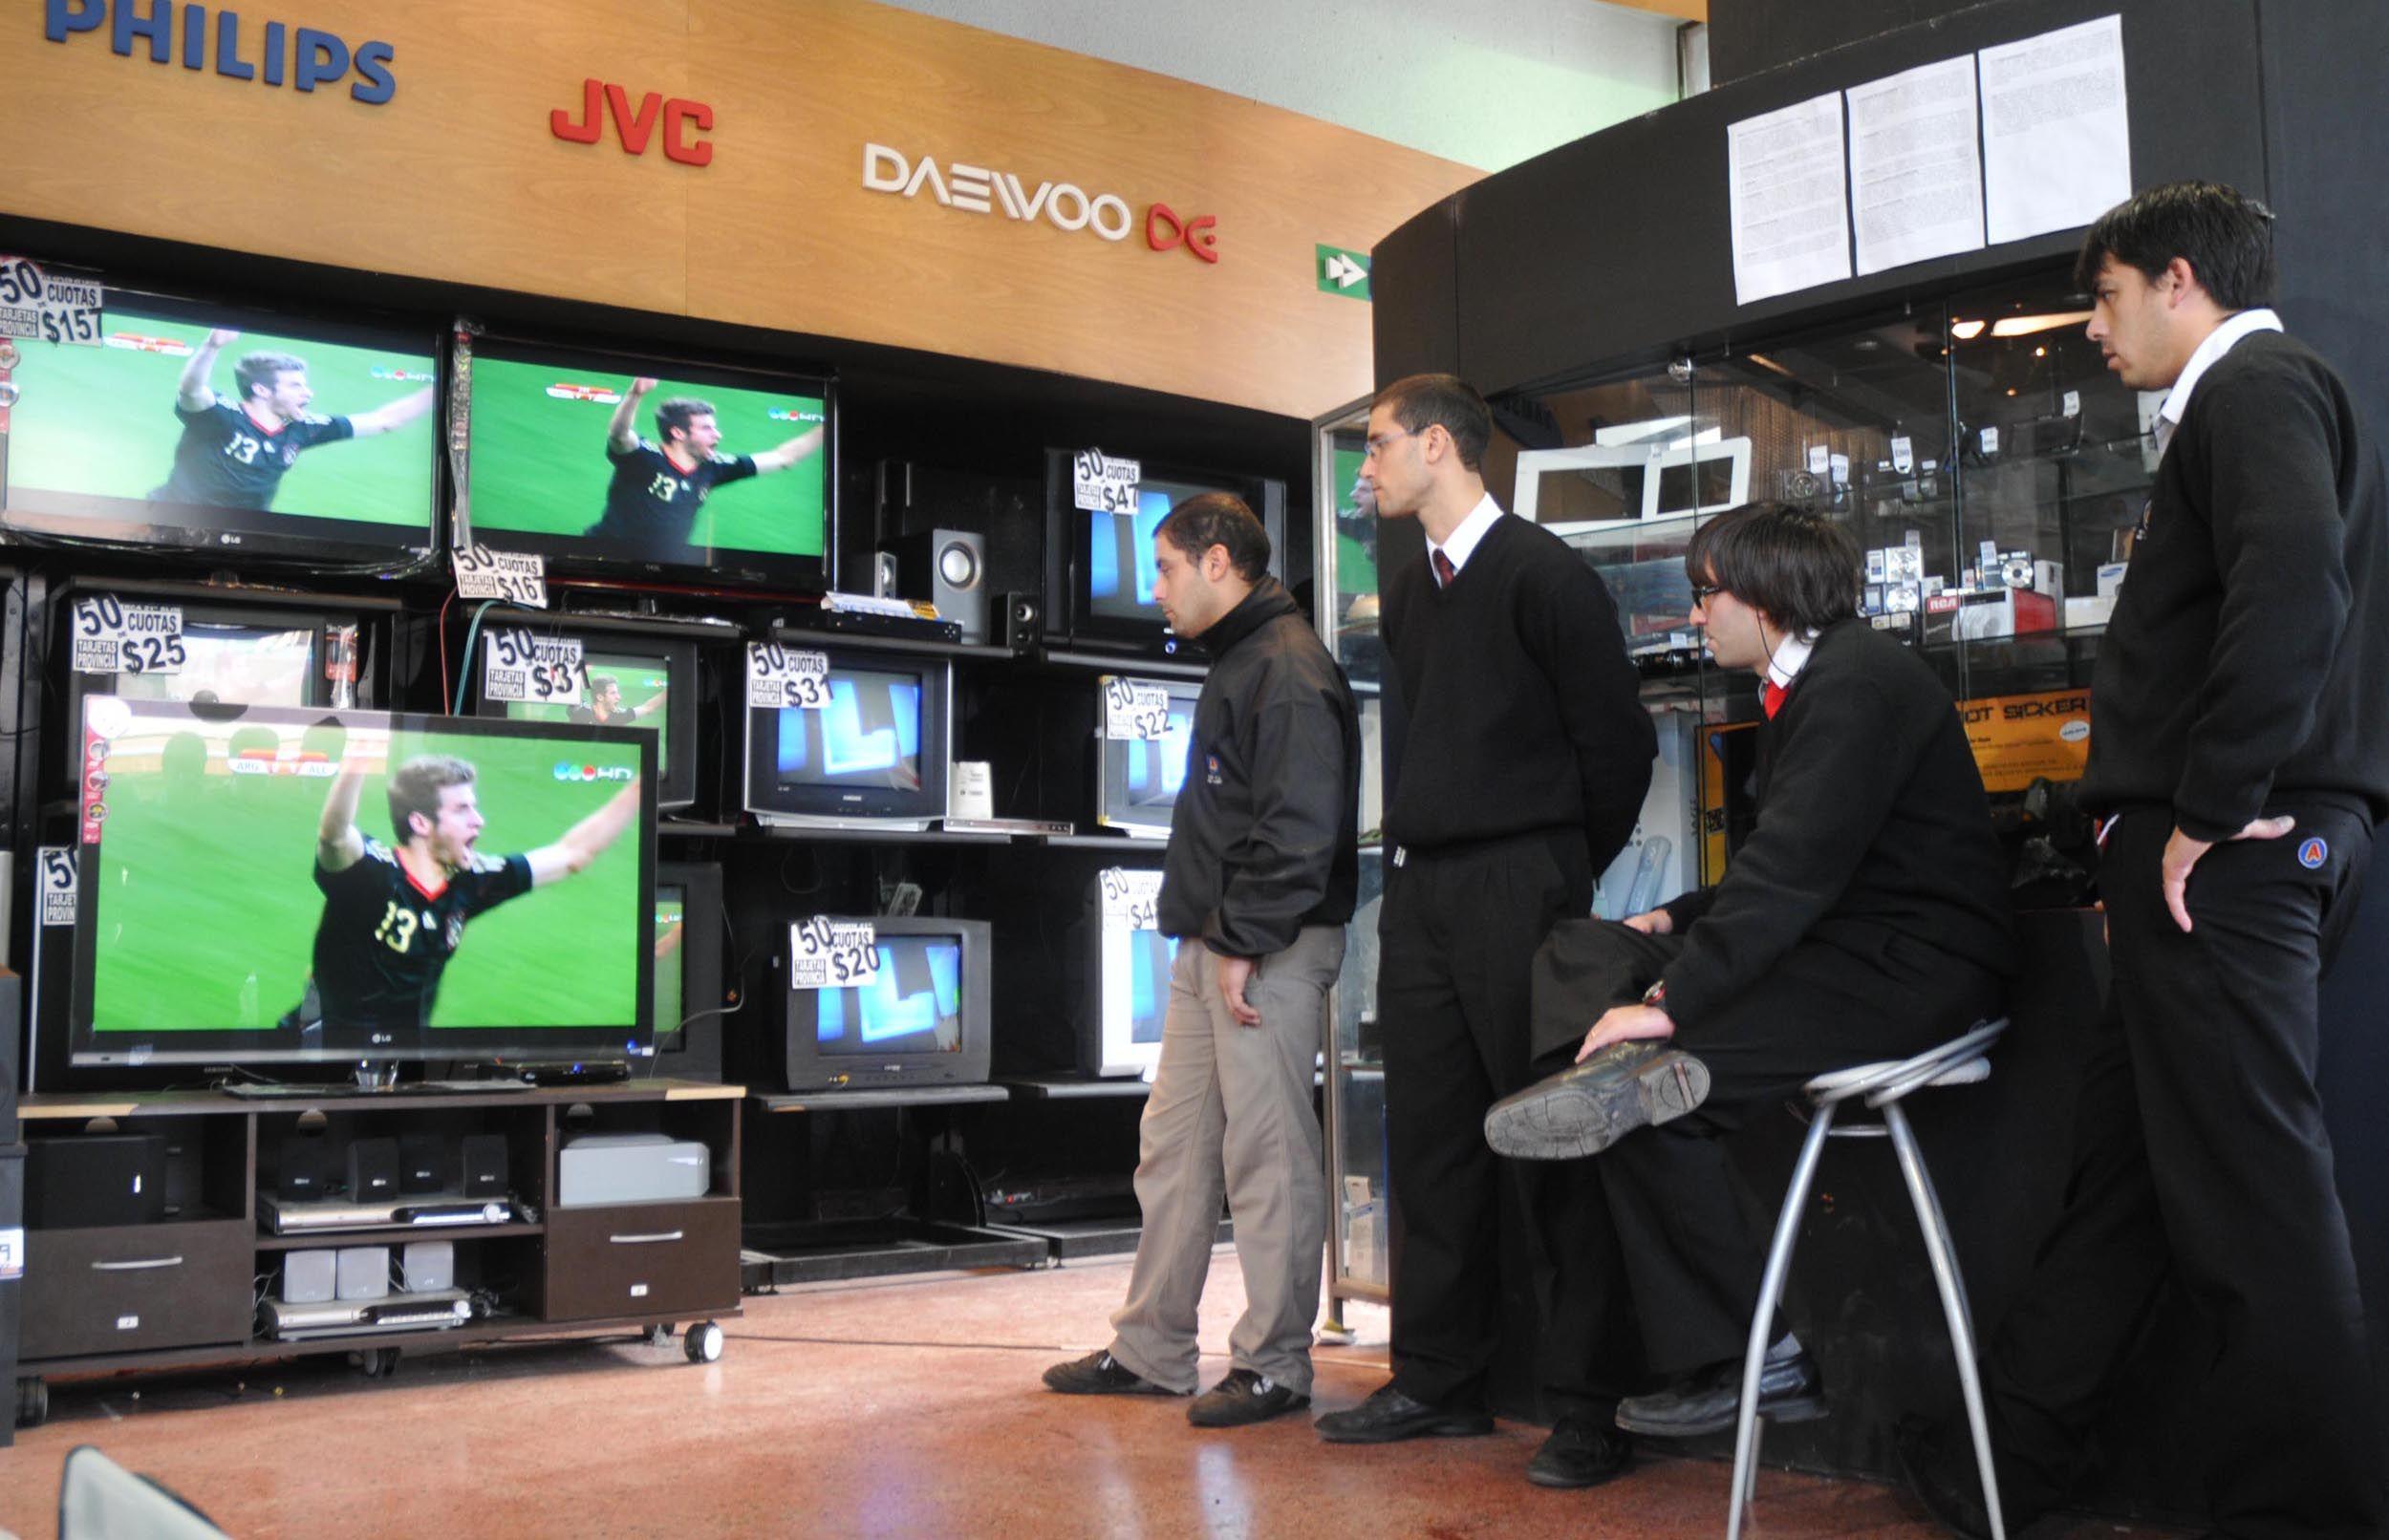 Operarios fueguinos van a comprar electrodomésticos a Chile